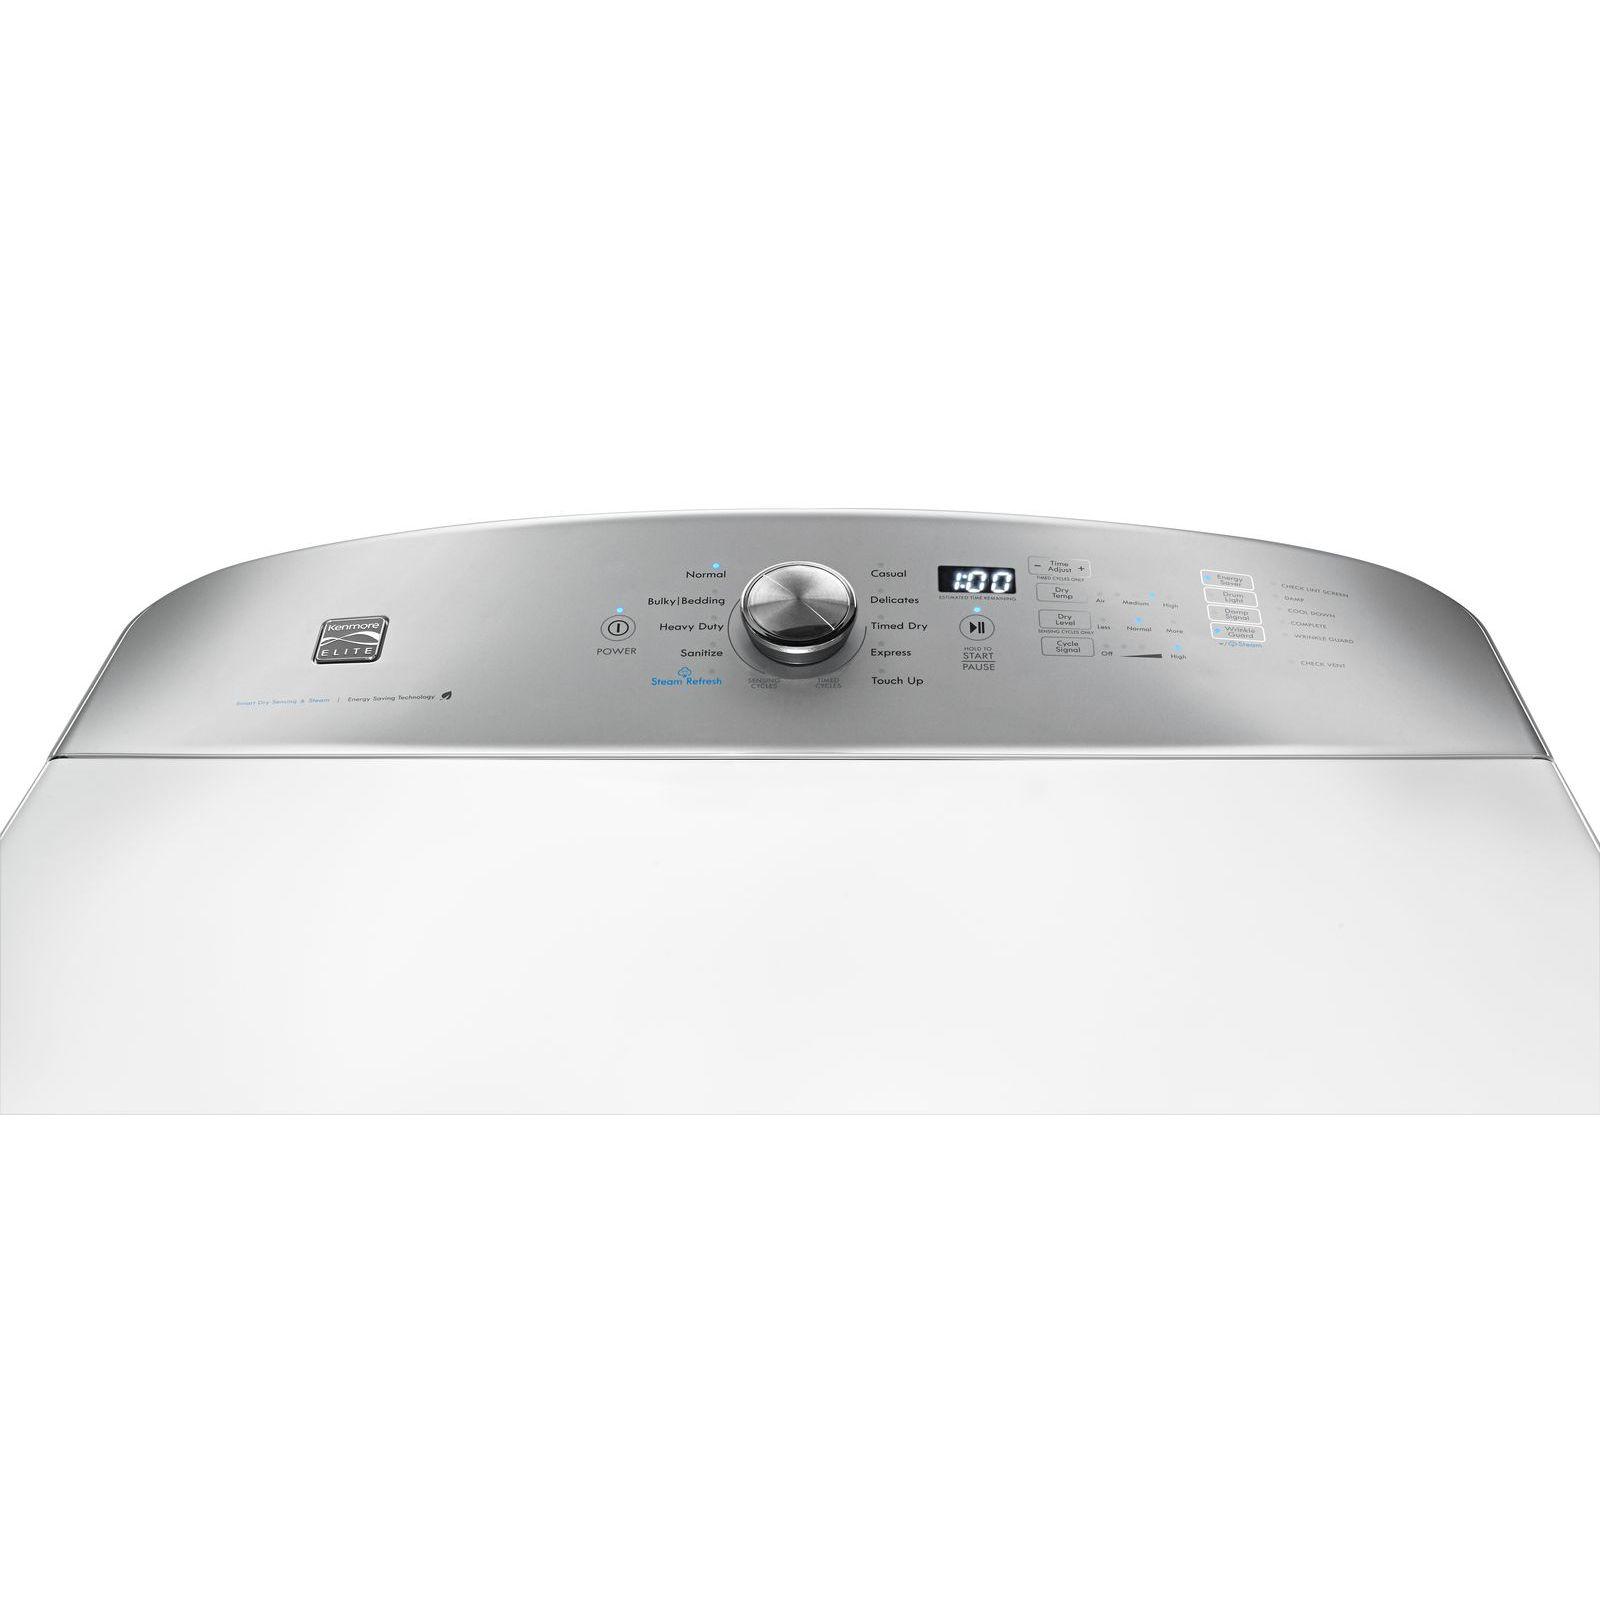 Kenmore Elite 71632 9.2 cu. ft. Gas Dryer w/ SmartDry Ultra Technology – White